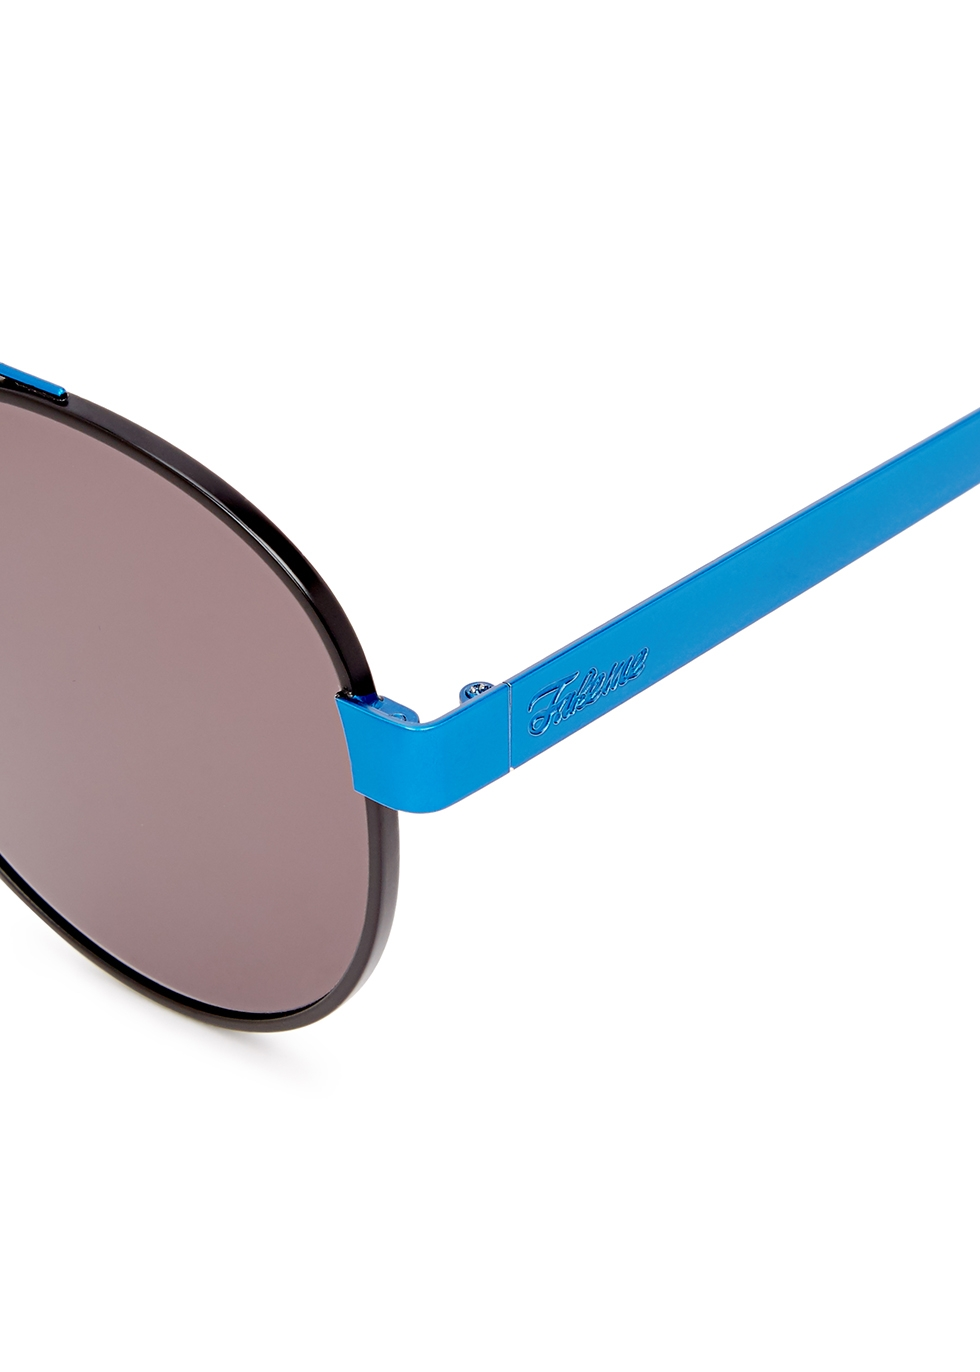 Forer blue round-frame sunglasses - FAKE ME